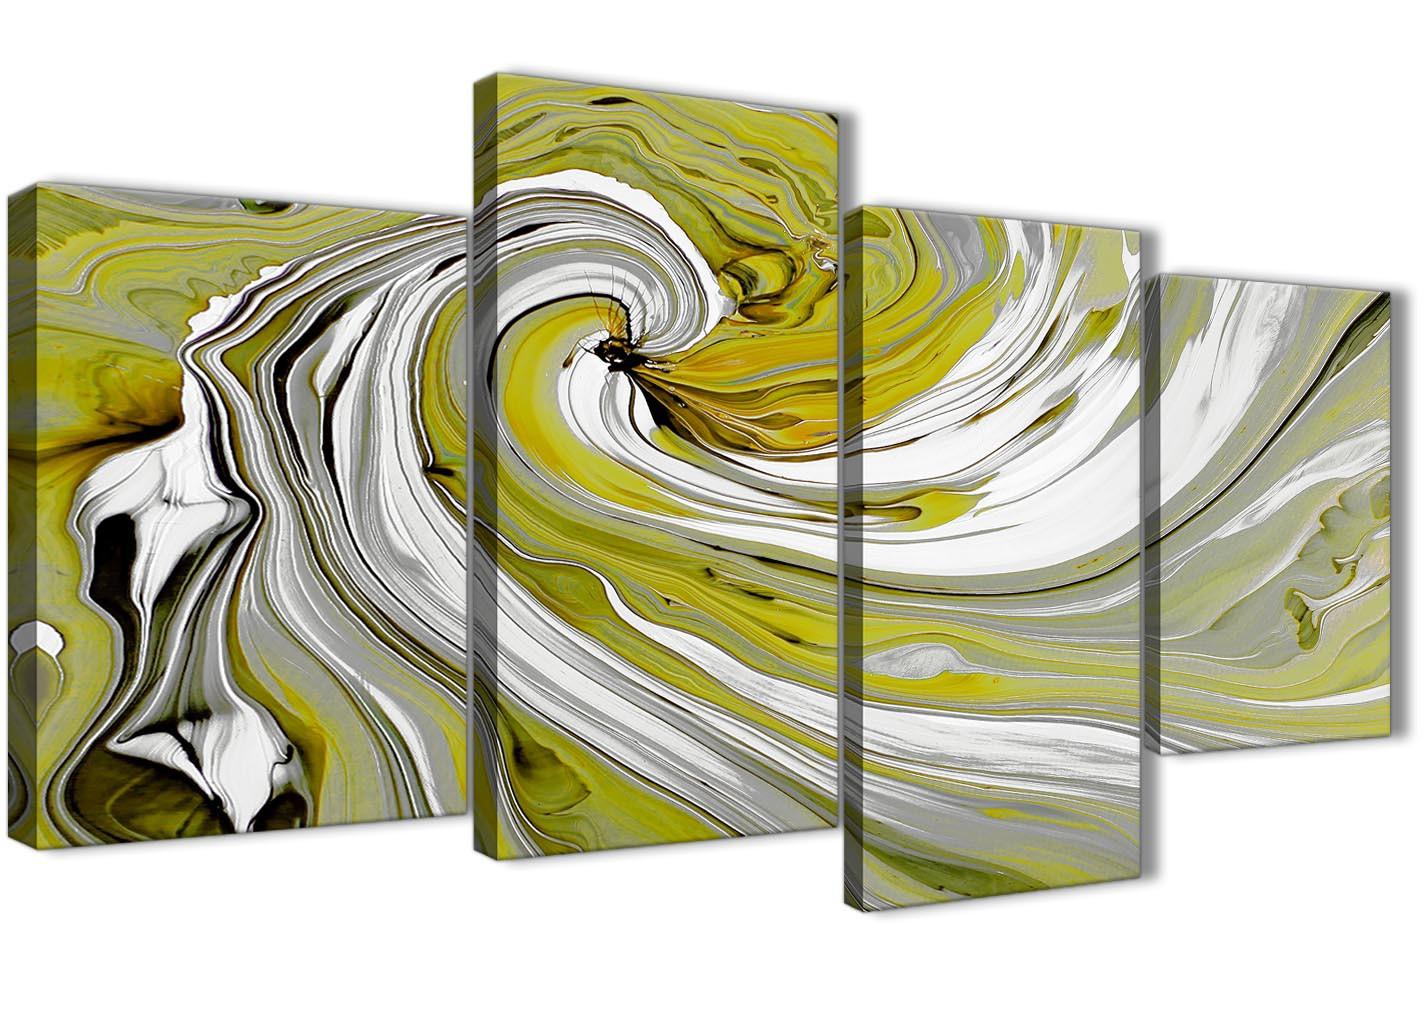 Large Lime Green Swirls Modern Abstract Canvas Wall Art - Split 4 ...